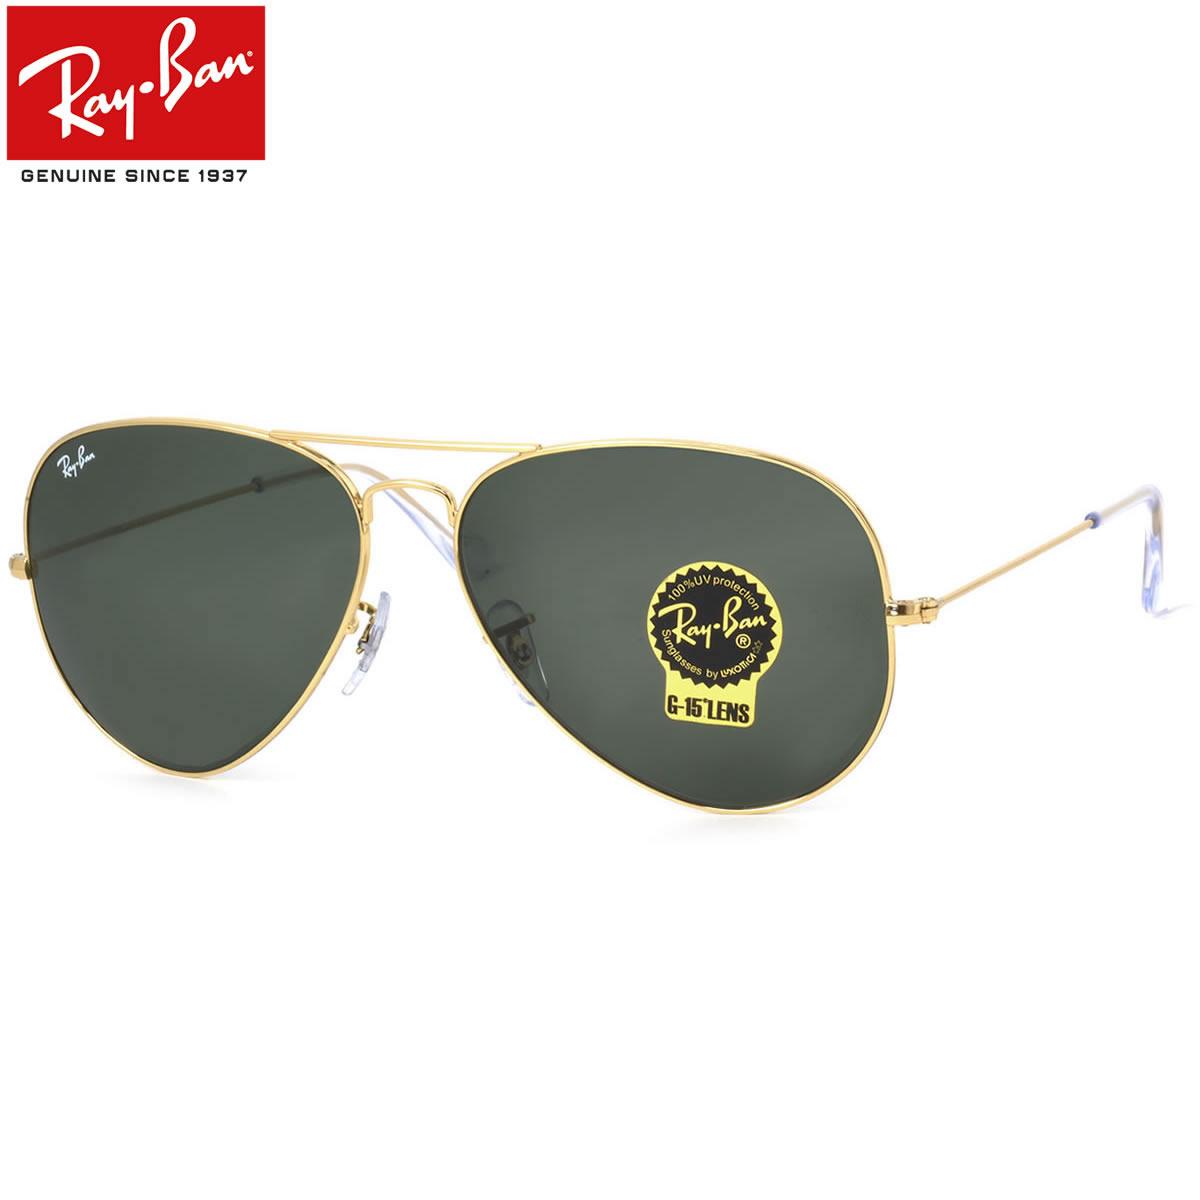 b9e871e2f07 Ray-Ban Sunglasses RB3026 L2846 62size AVIATOR II LARGE GENUINE NEW rayban  ray ban